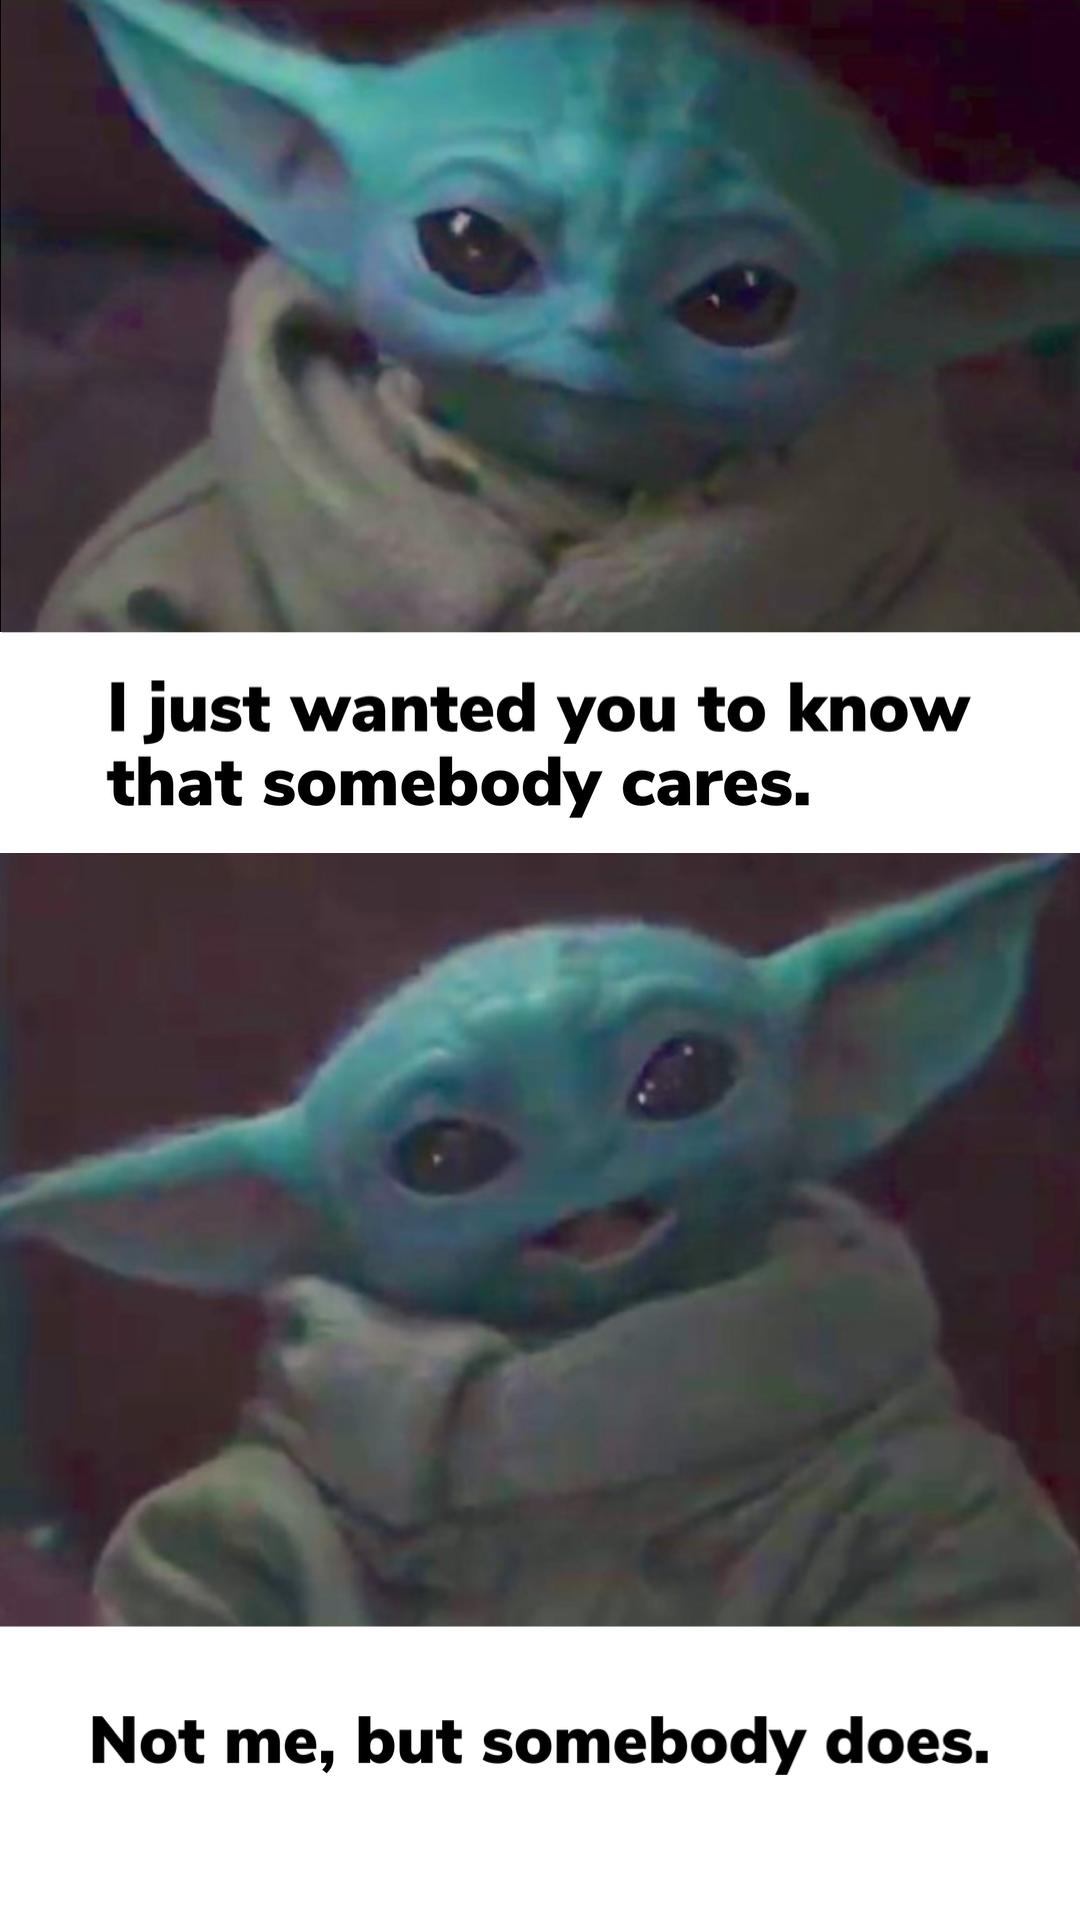 Pin By Penny Ronan On Baby Yoda Funny Cute Memes Yoda Funny Star Wars Humor